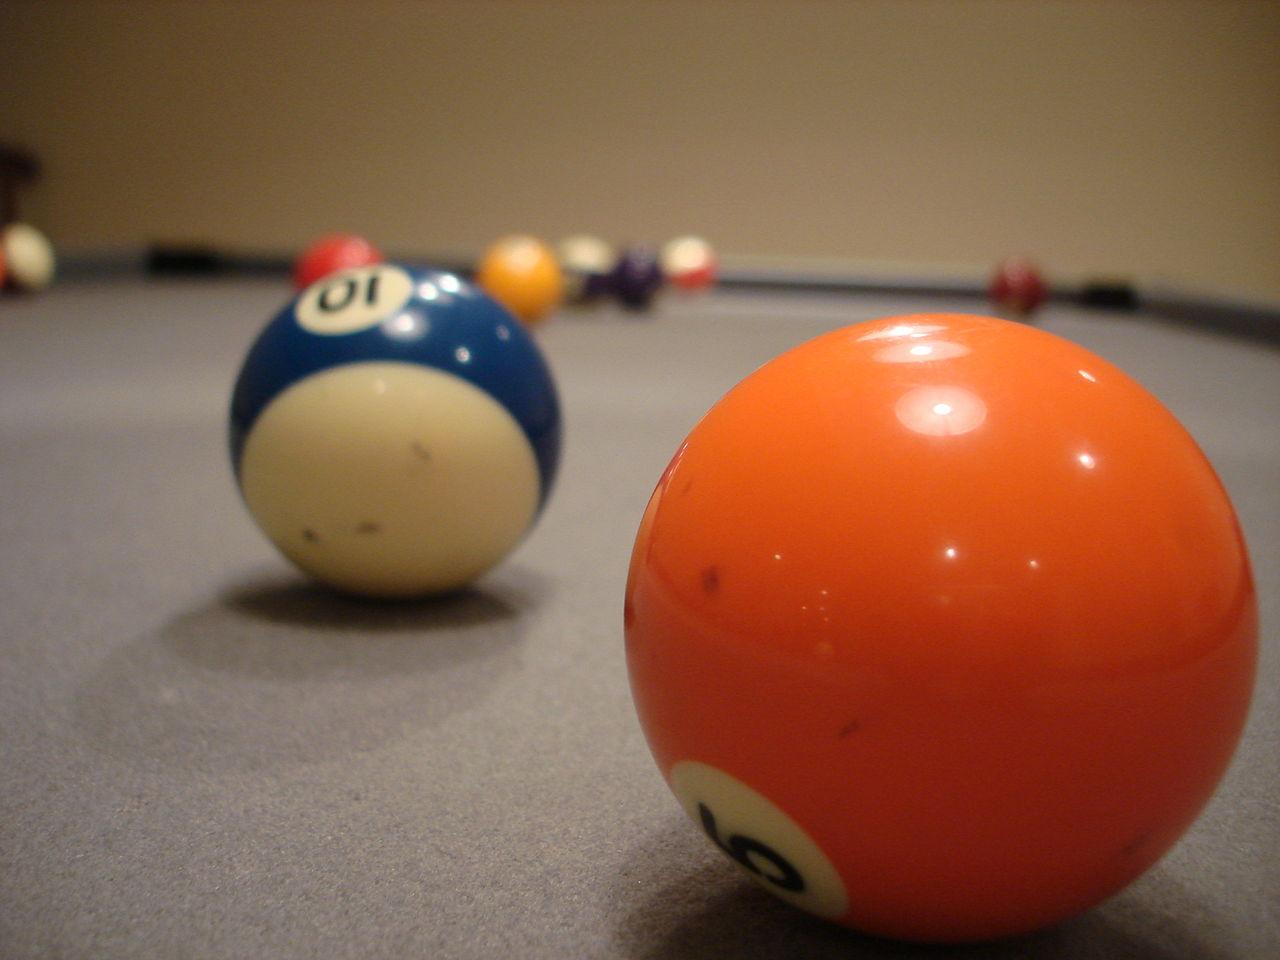 Pool Table Balls Scattered Súbor:Scattered b...